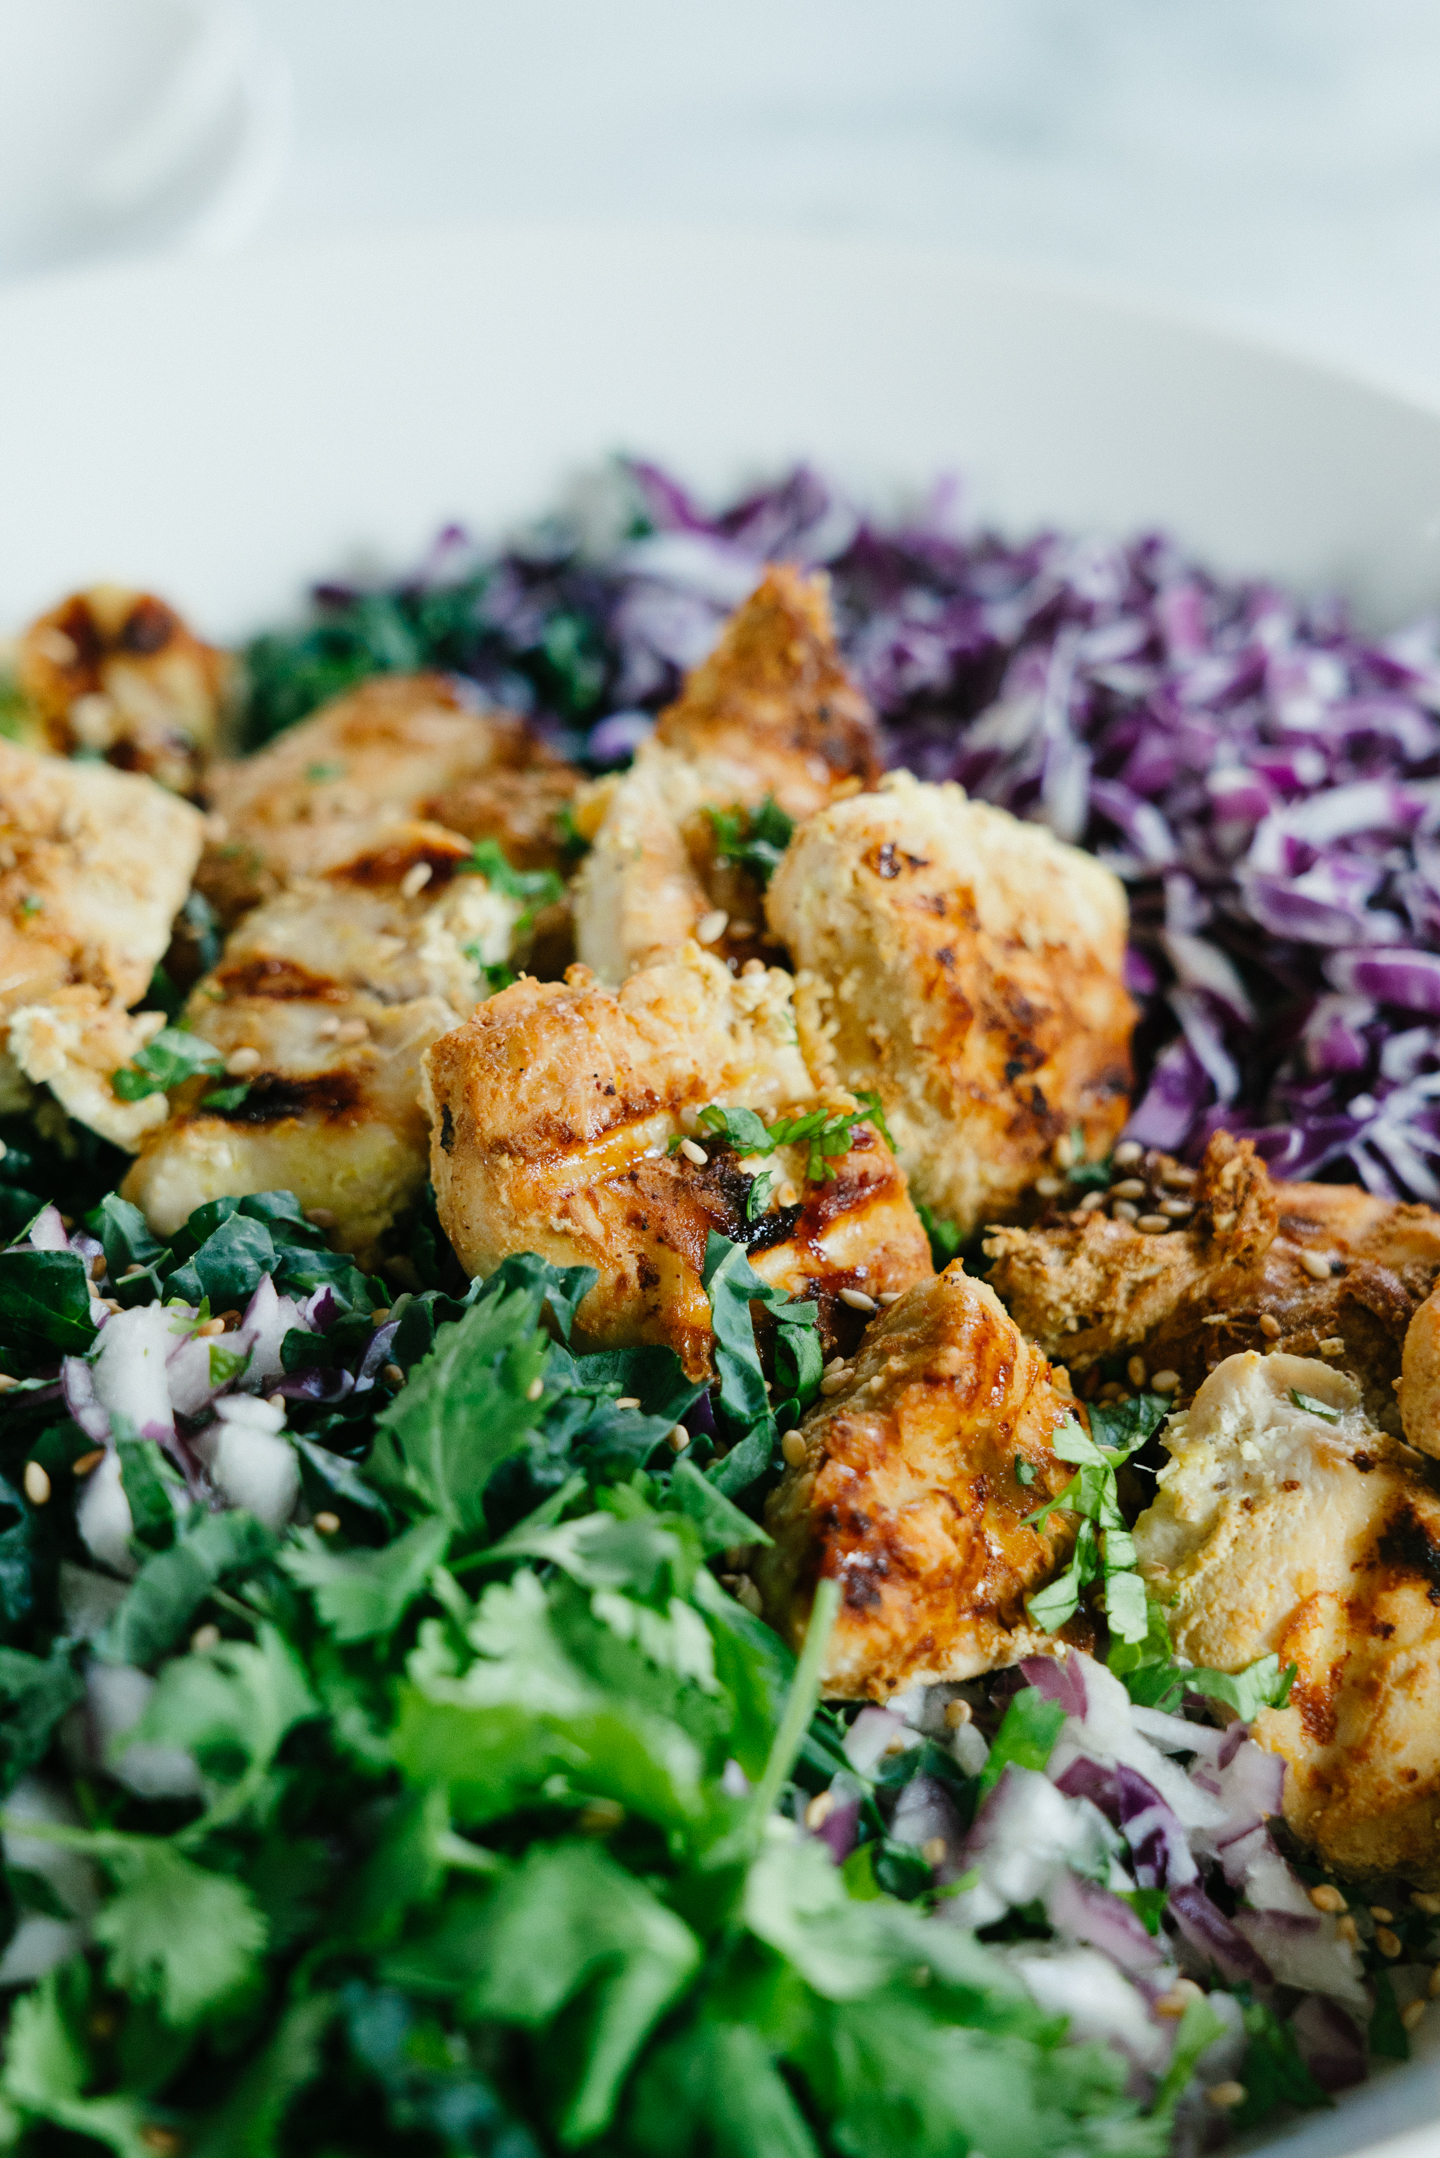 Grilled Honey Yogurt Chicken Over Cabbage Kale Salad